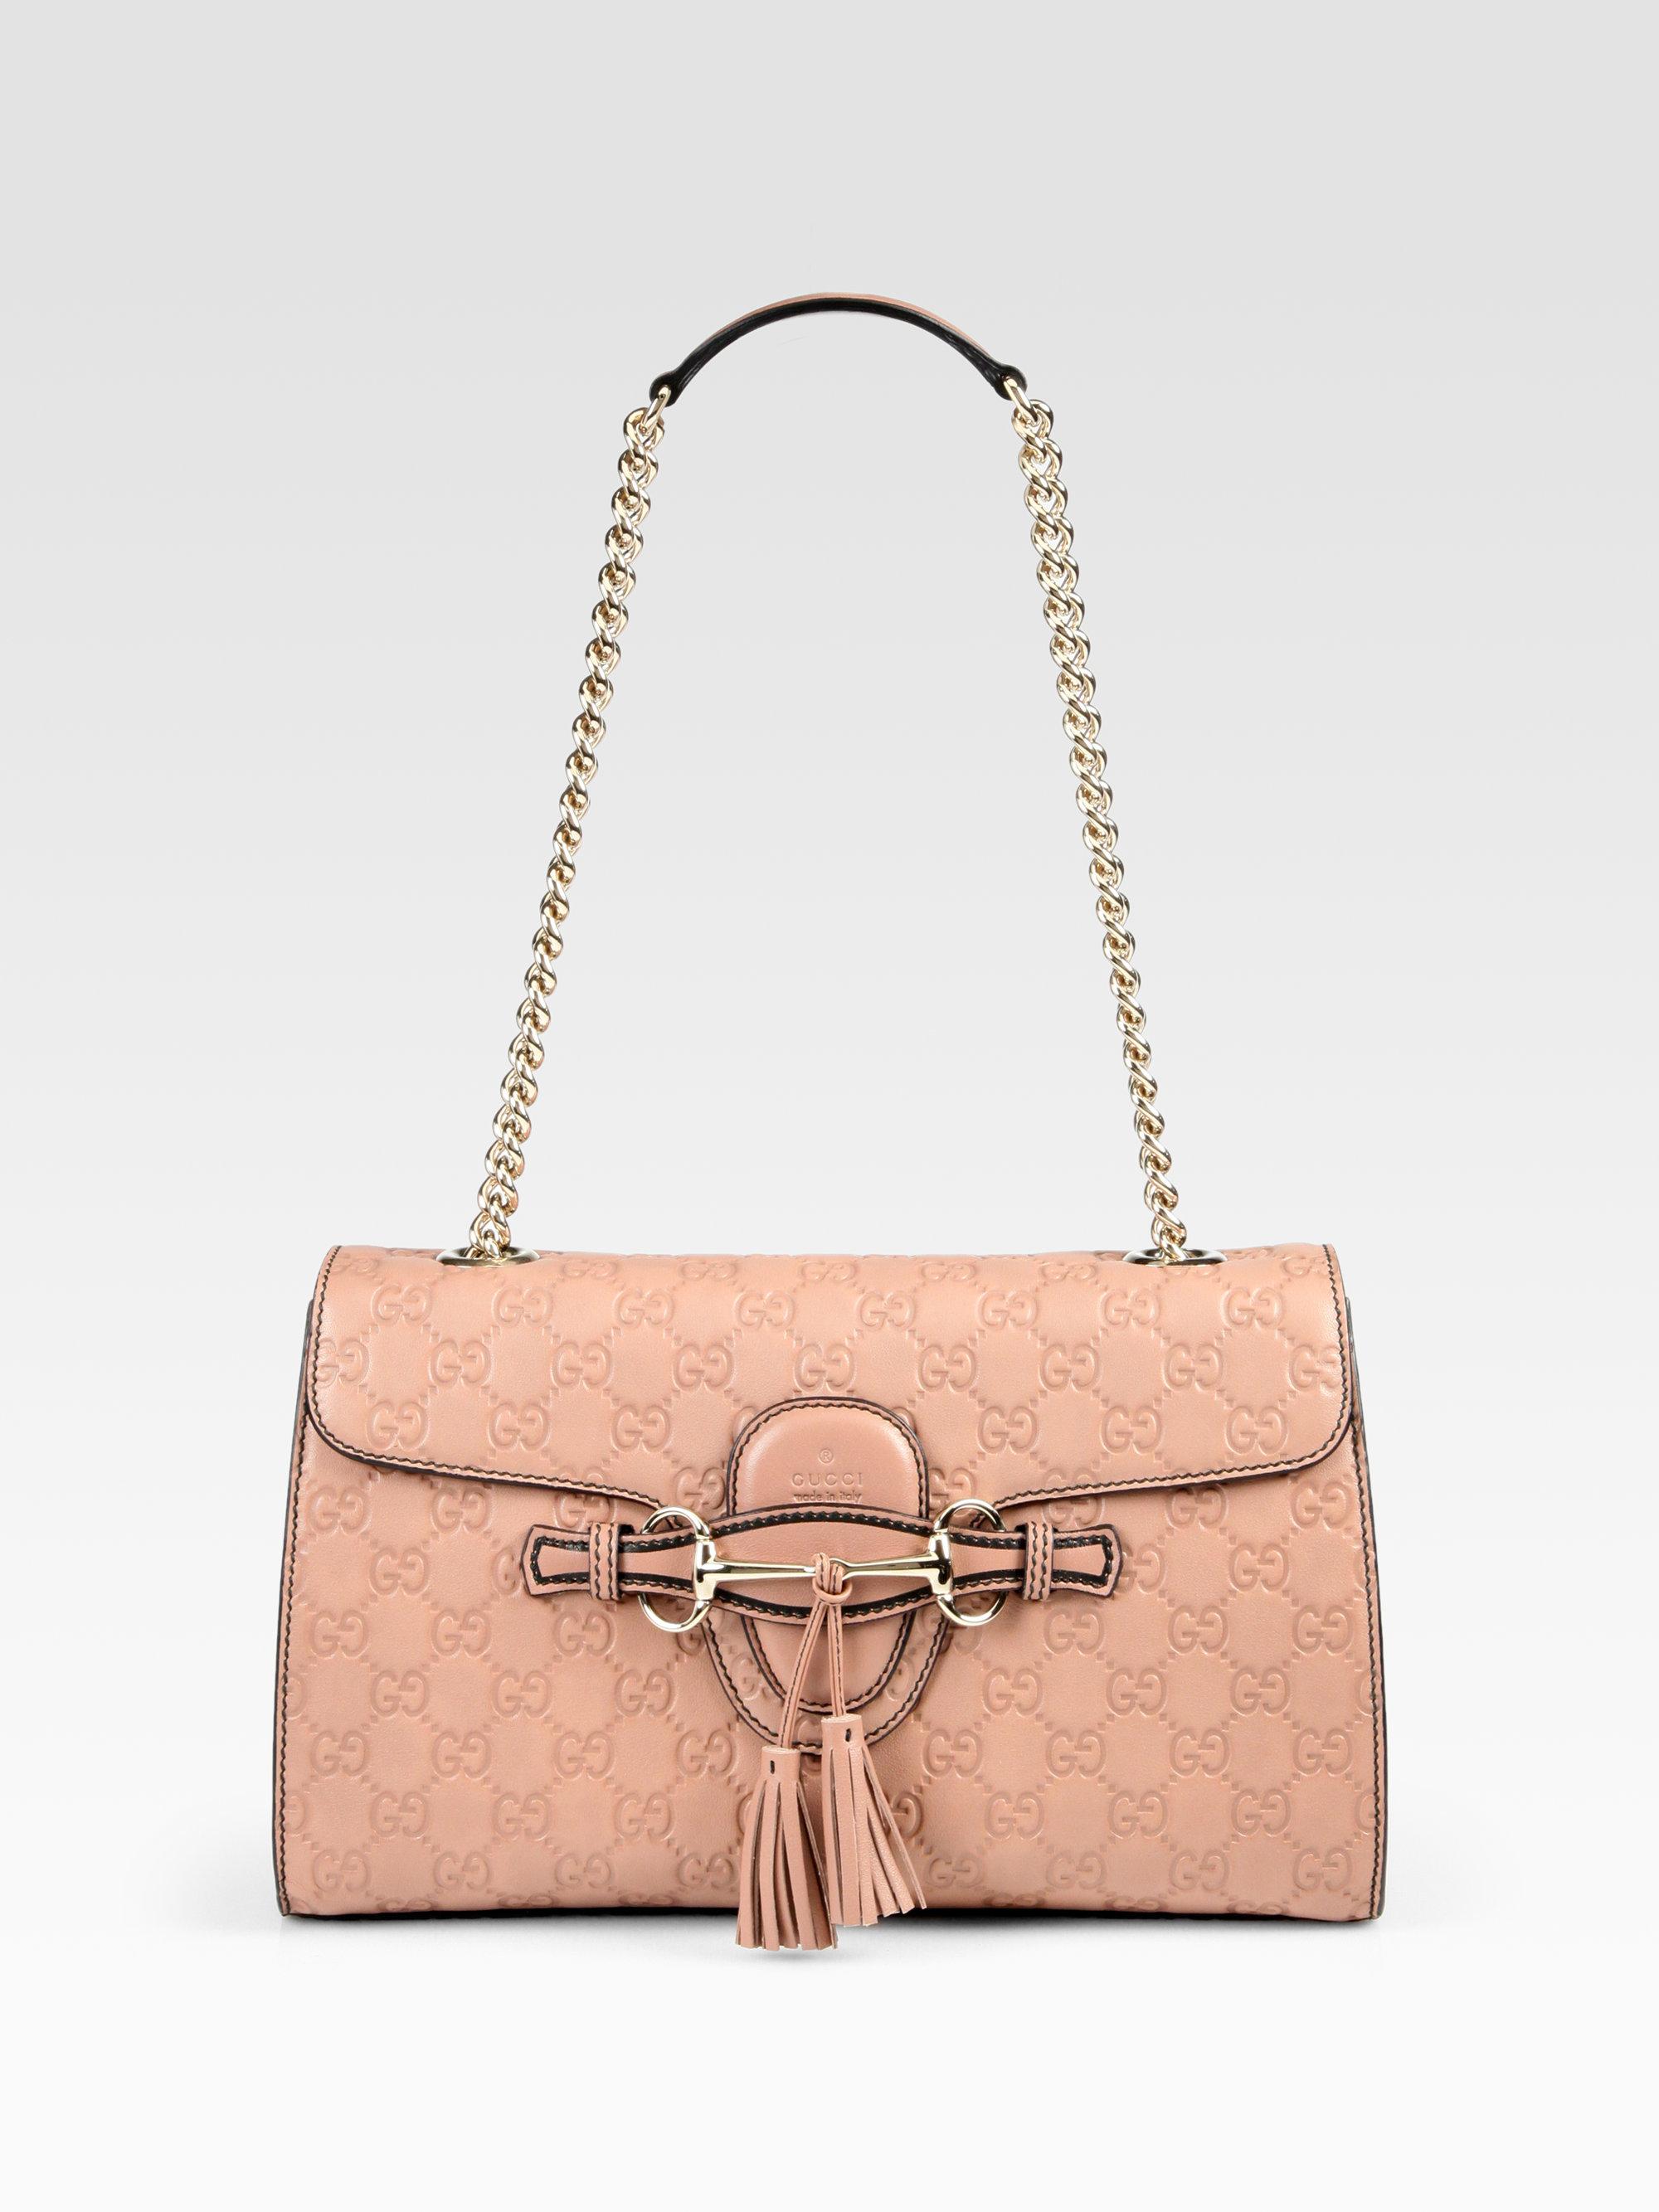 cca8a5e4e Gucci Emily Medium Shoulder Bag in Pink - Lyst